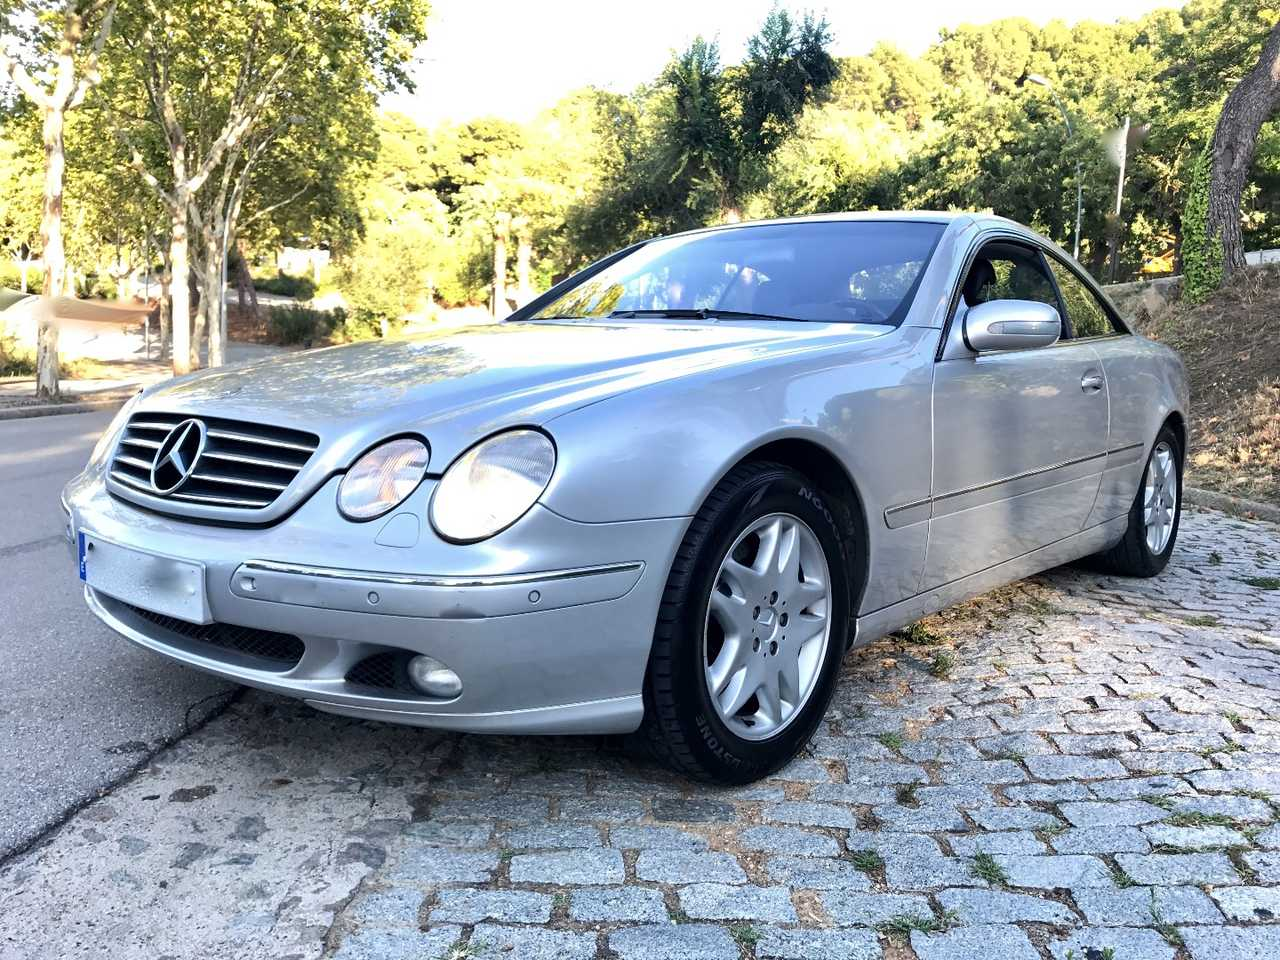 Mercedes Clase CL 500. Ideal coleccionista. Impecable.   - Foto 1